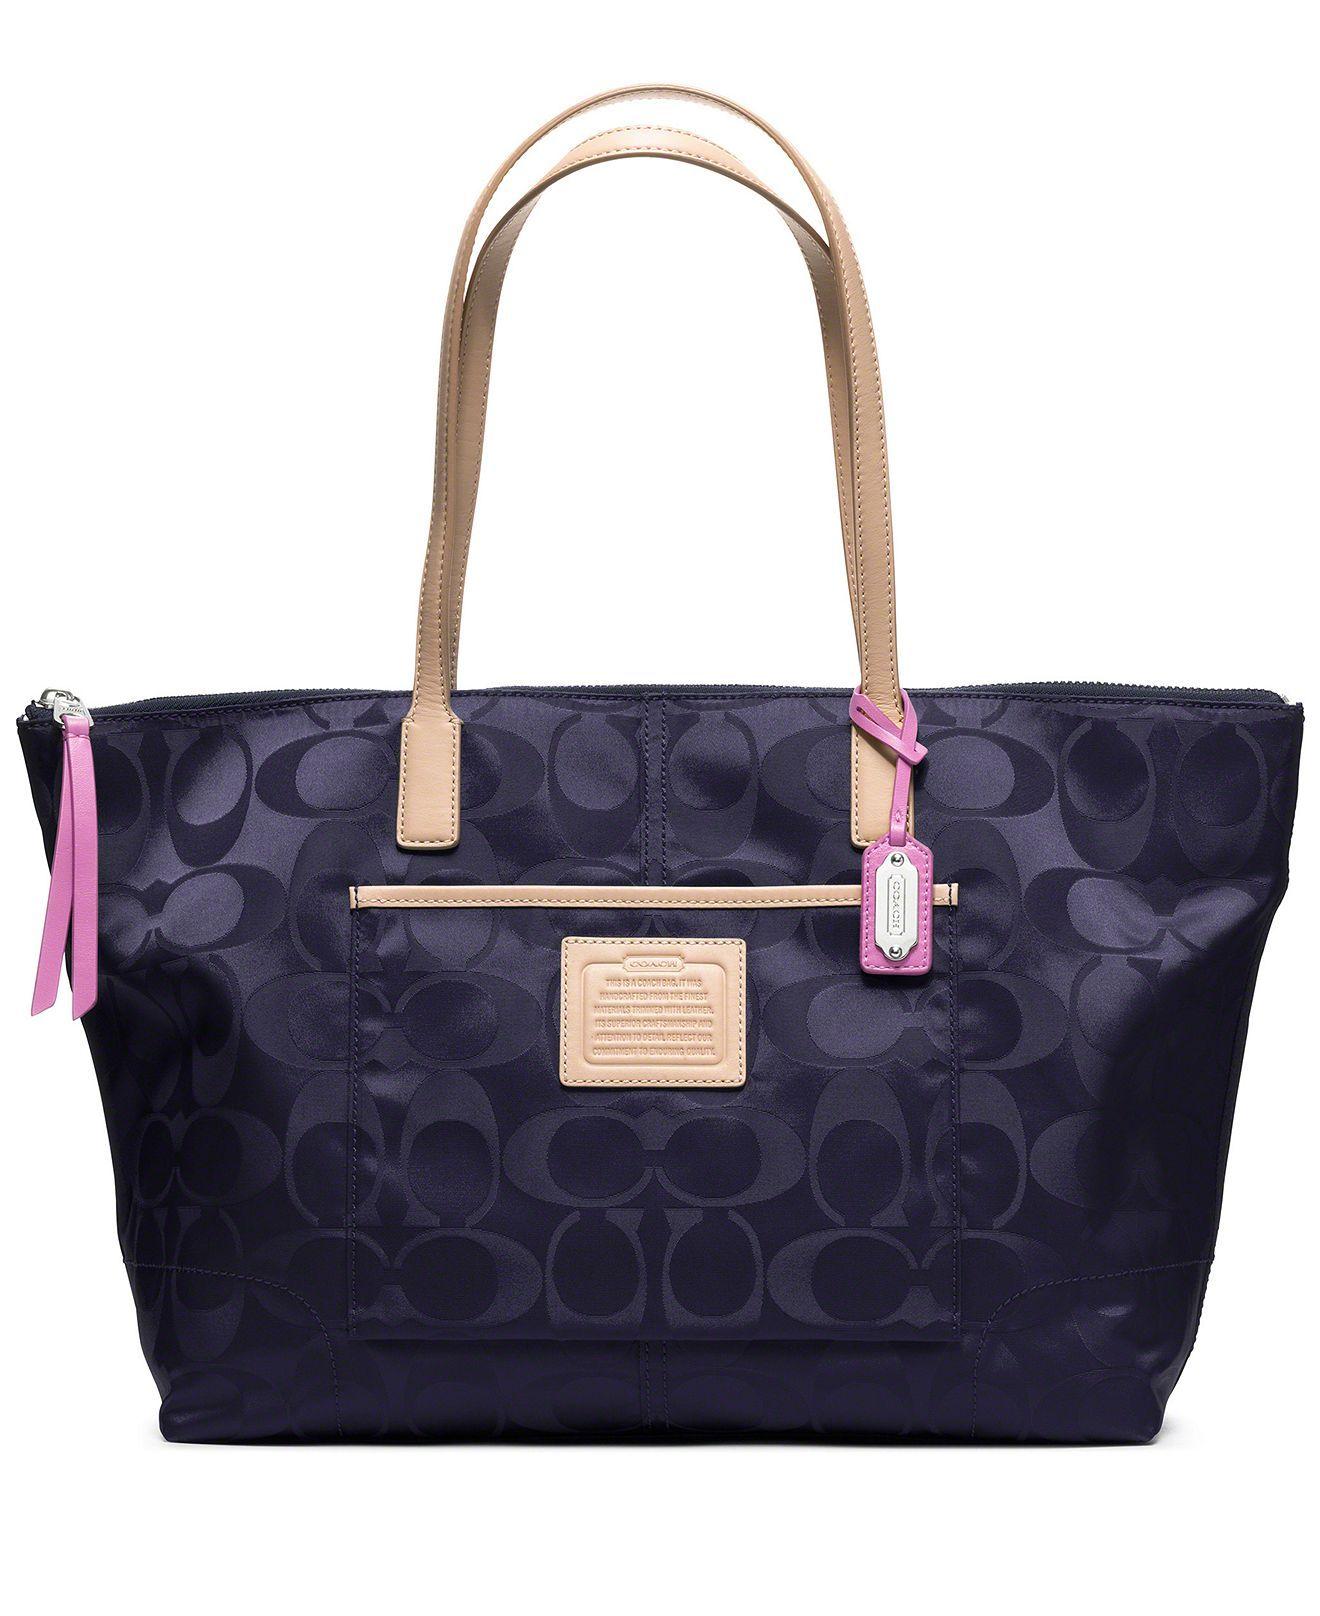 coach waverly handbags macys price coachwholesale